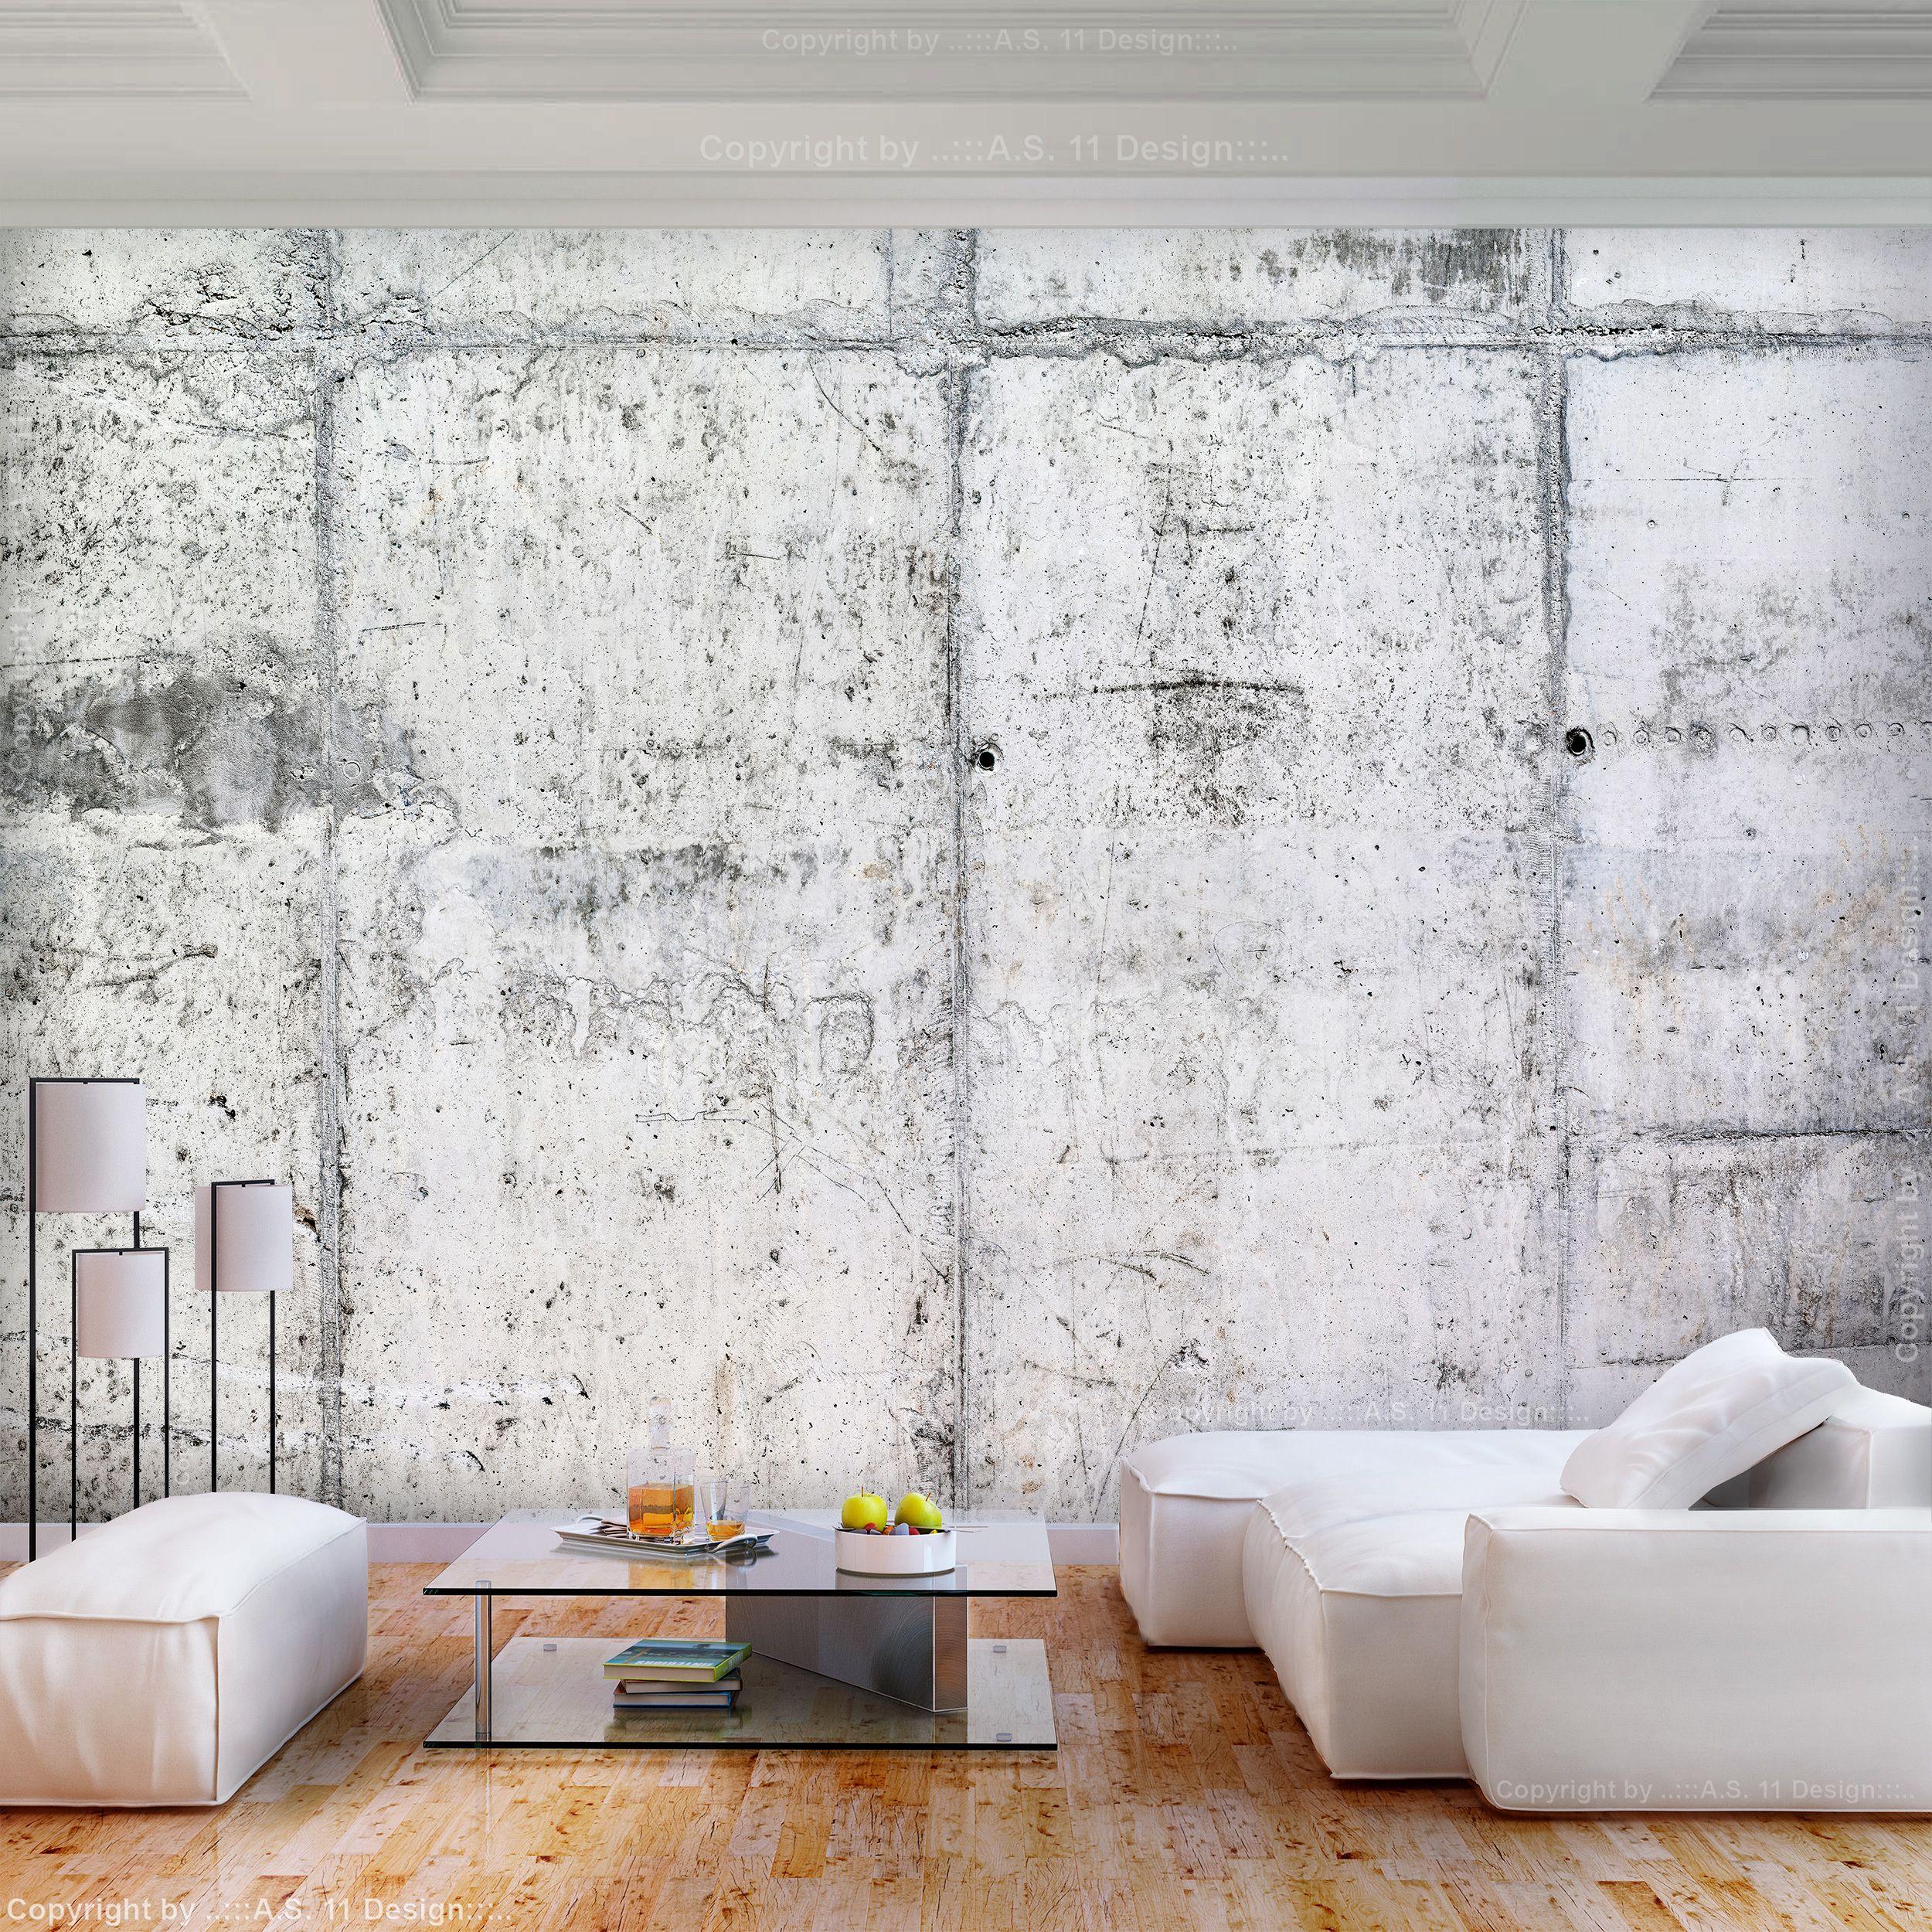 Vlies Fototapete Steinwand Beton Optik Grau Tapete Wohnzimmer Wandbilder Xxl 127 Ebay Tapete Wohnzimmer Fototapete Steinwand Fototapete